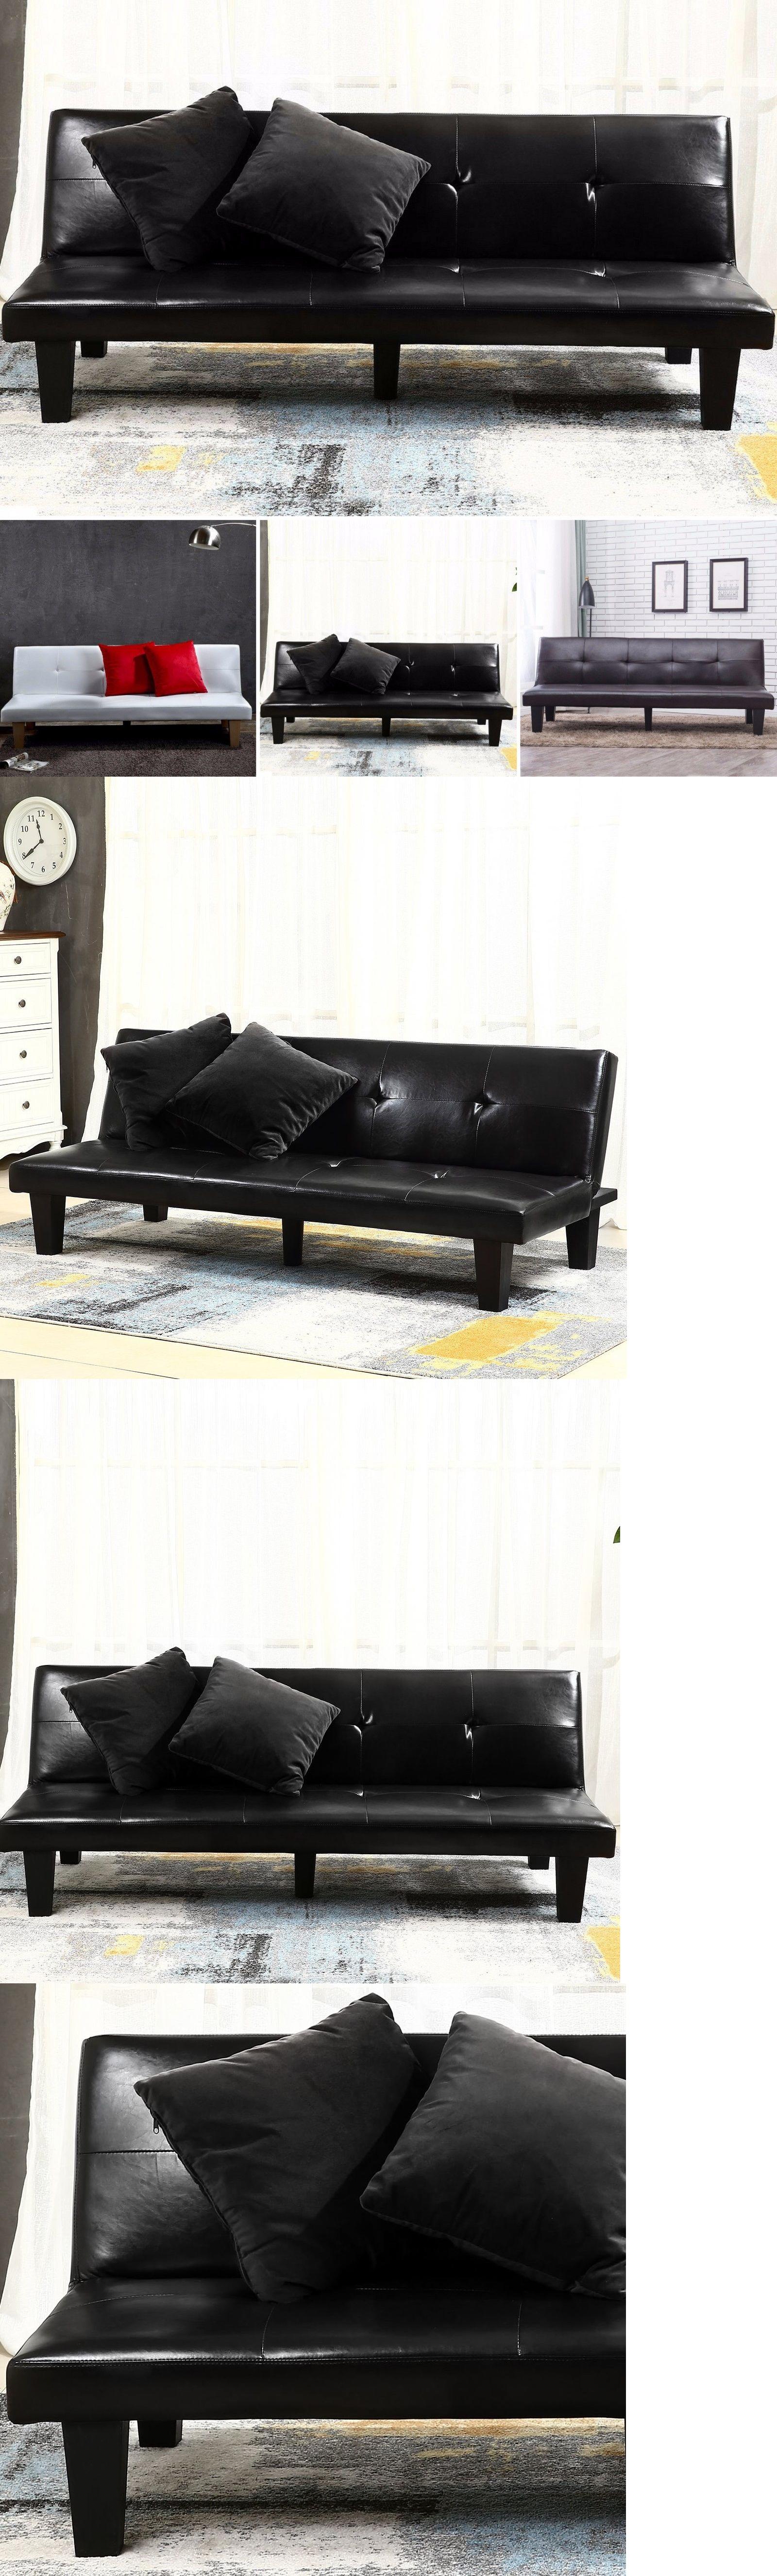 Sofas loveseats and chaises convertible sofa futon dorm